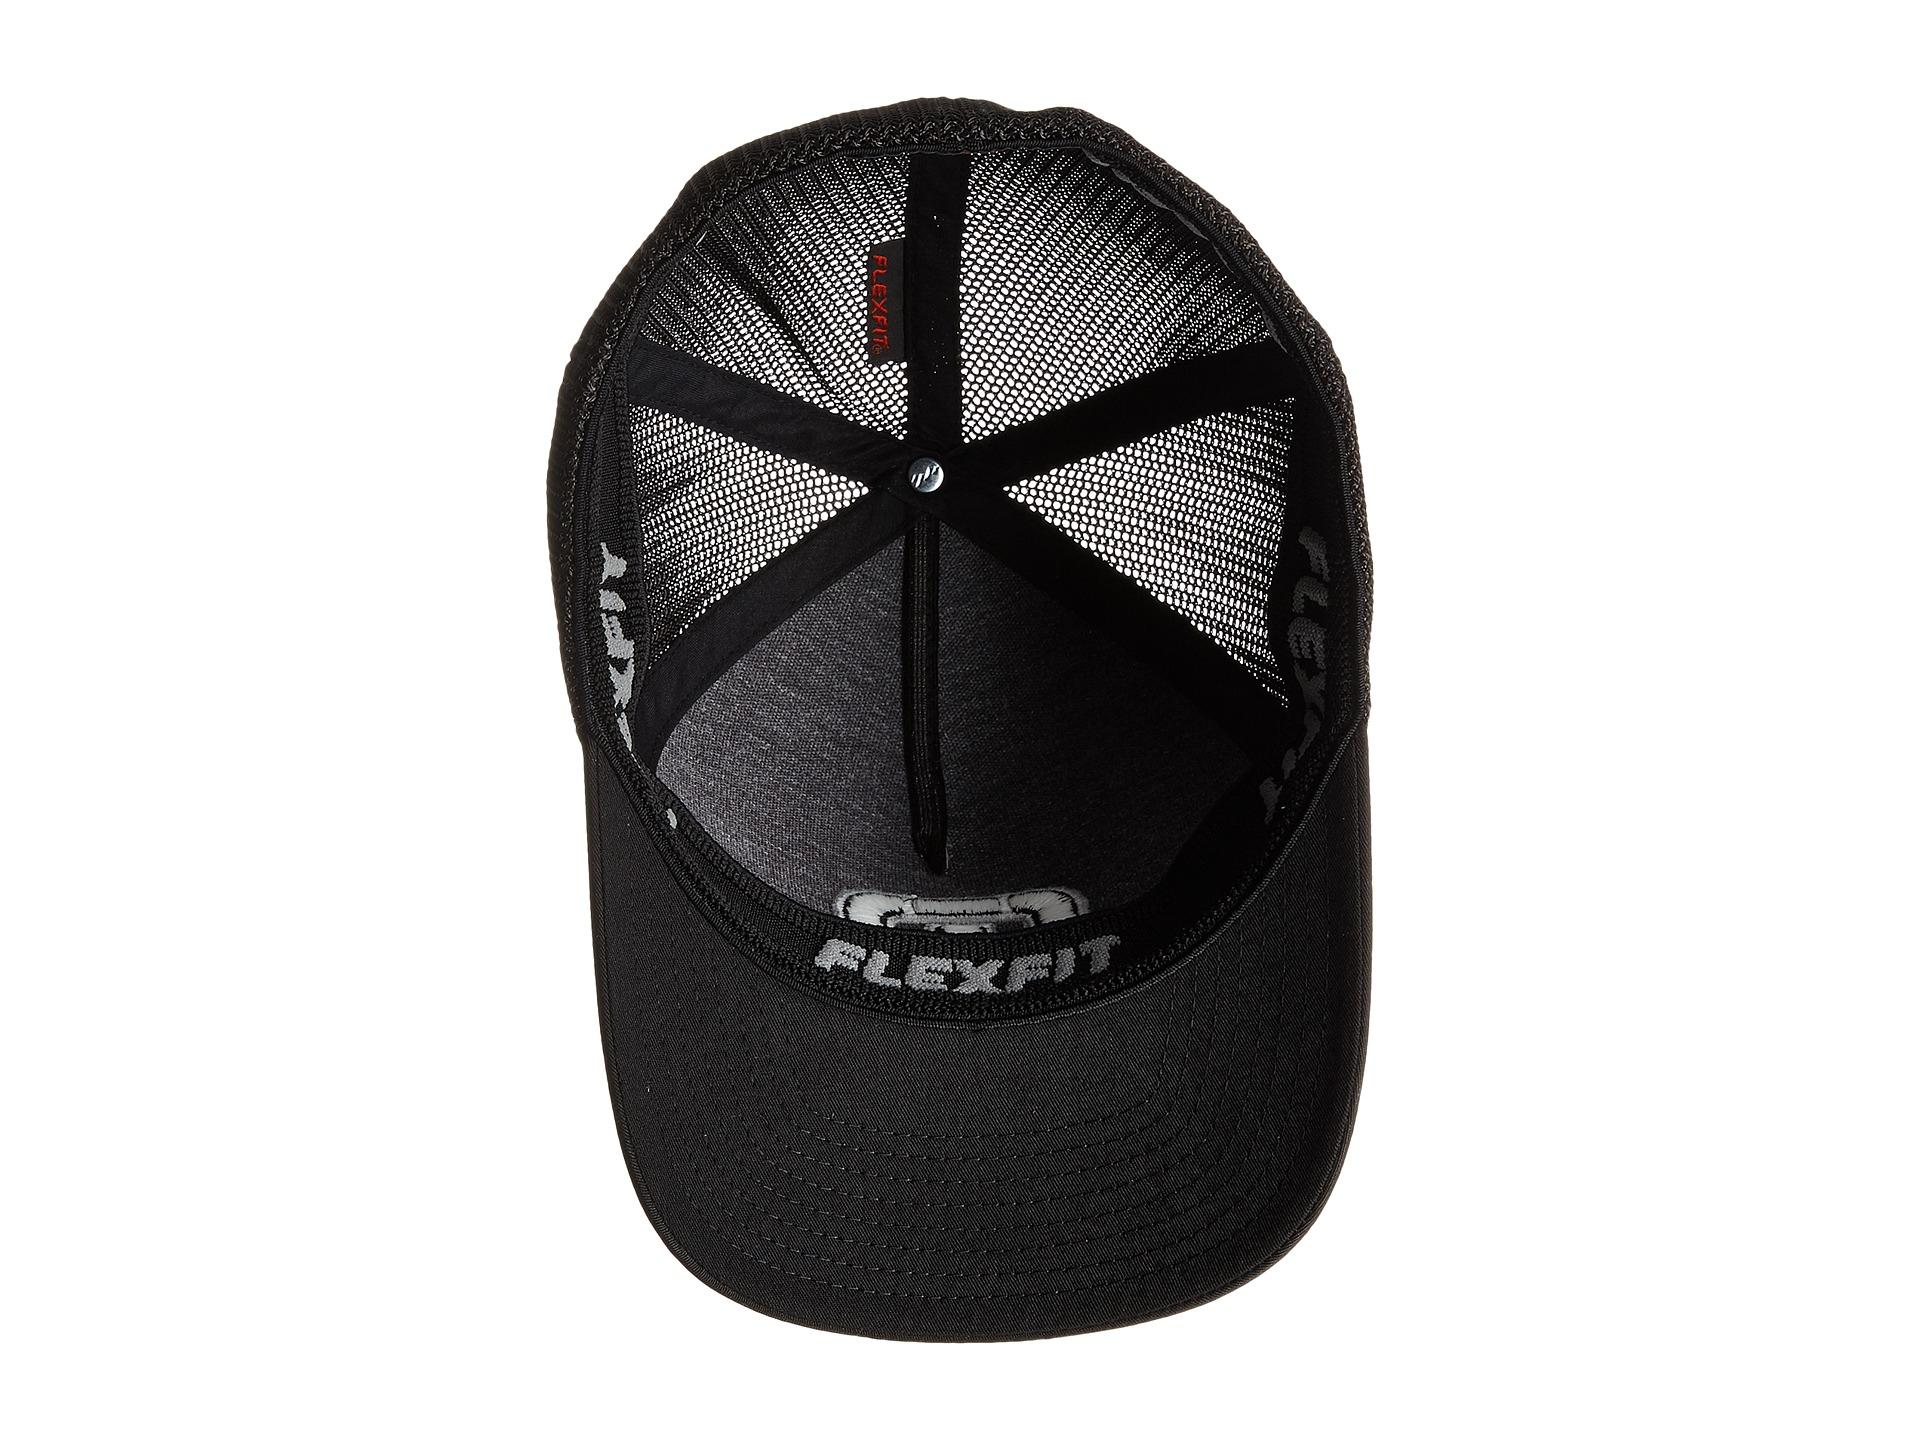 cheap for discount ce0fc 37ffa ... hot lyst travis mathew henderson hat in black for men f3103 17231